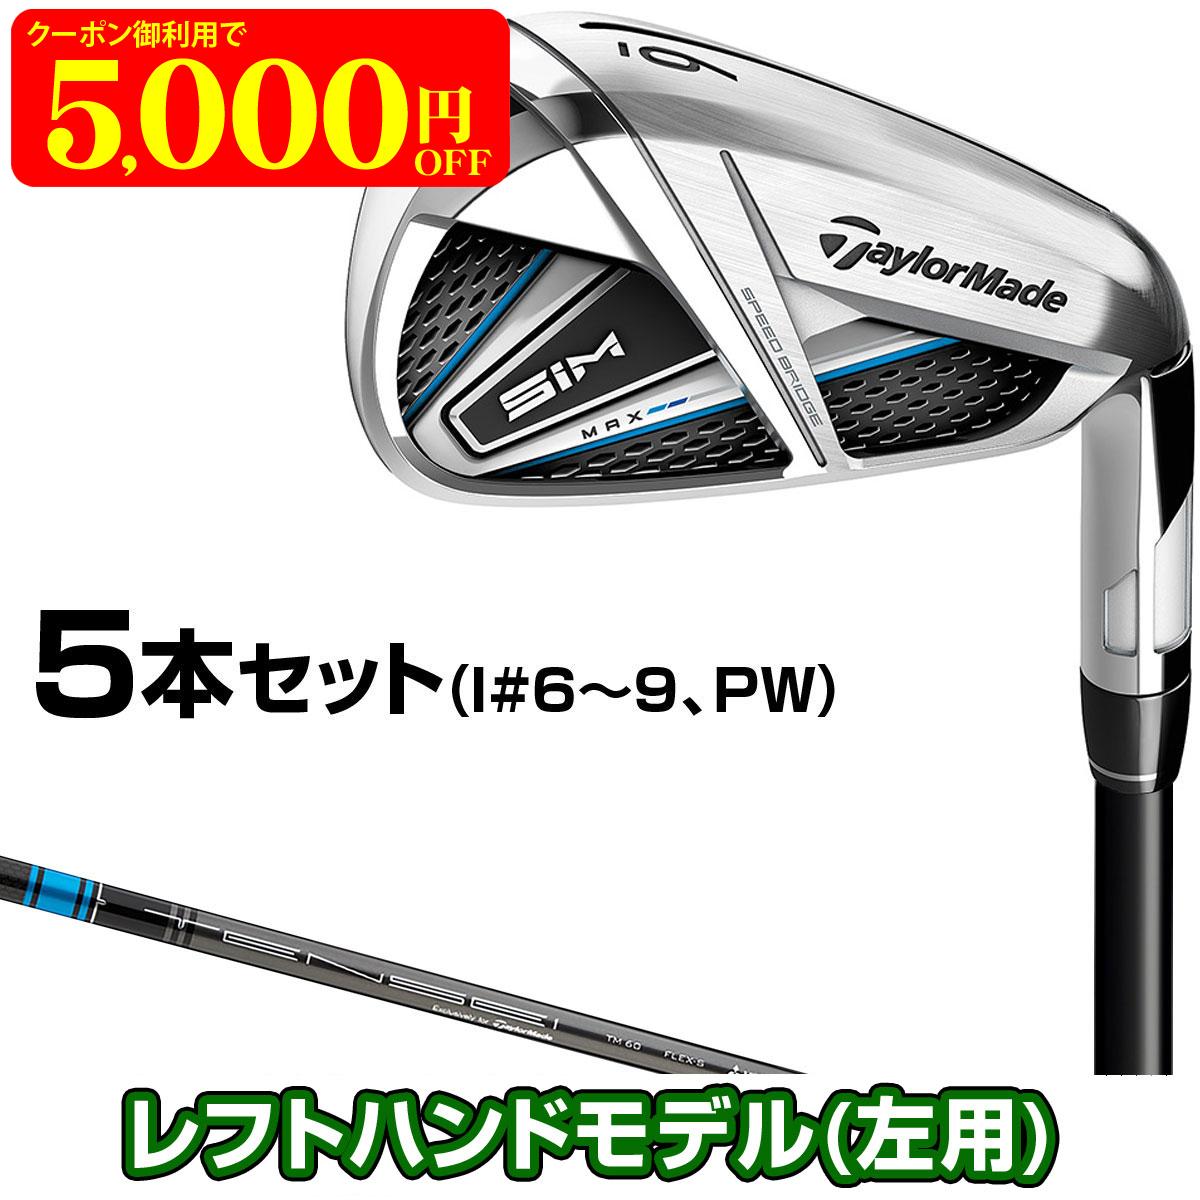 TaylorMade(テーラーメイド)日本正規品 SIM MAX(シムマックス)アイアン 2020新製品 TENSEI BLUE TM60カーボンシャフト 5本セット(I#6~9、PW) 「レフトハンドモデル(左用)」 【あす楽対応】